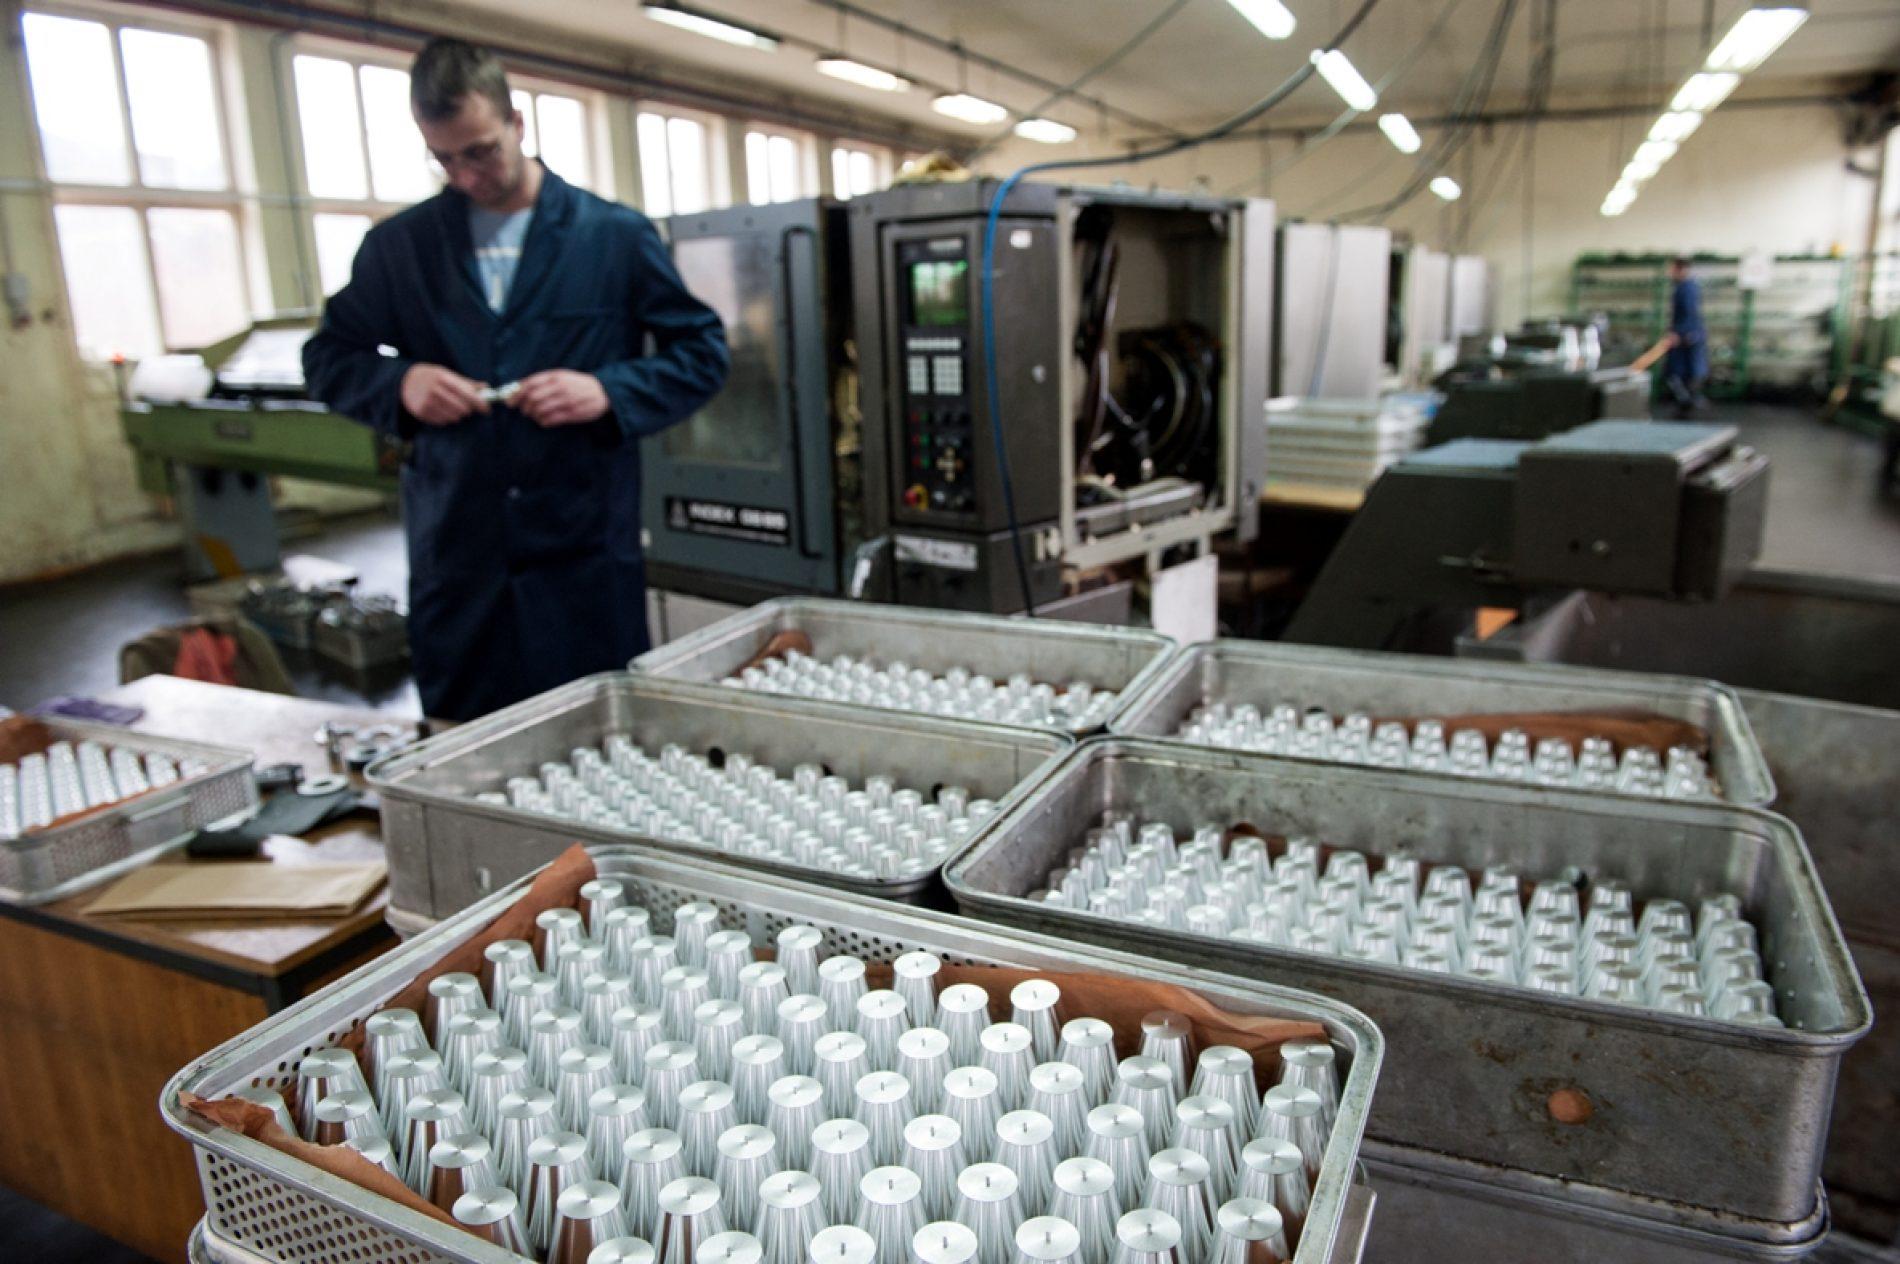 'Binas' Bugojno upošljava 49 radnika